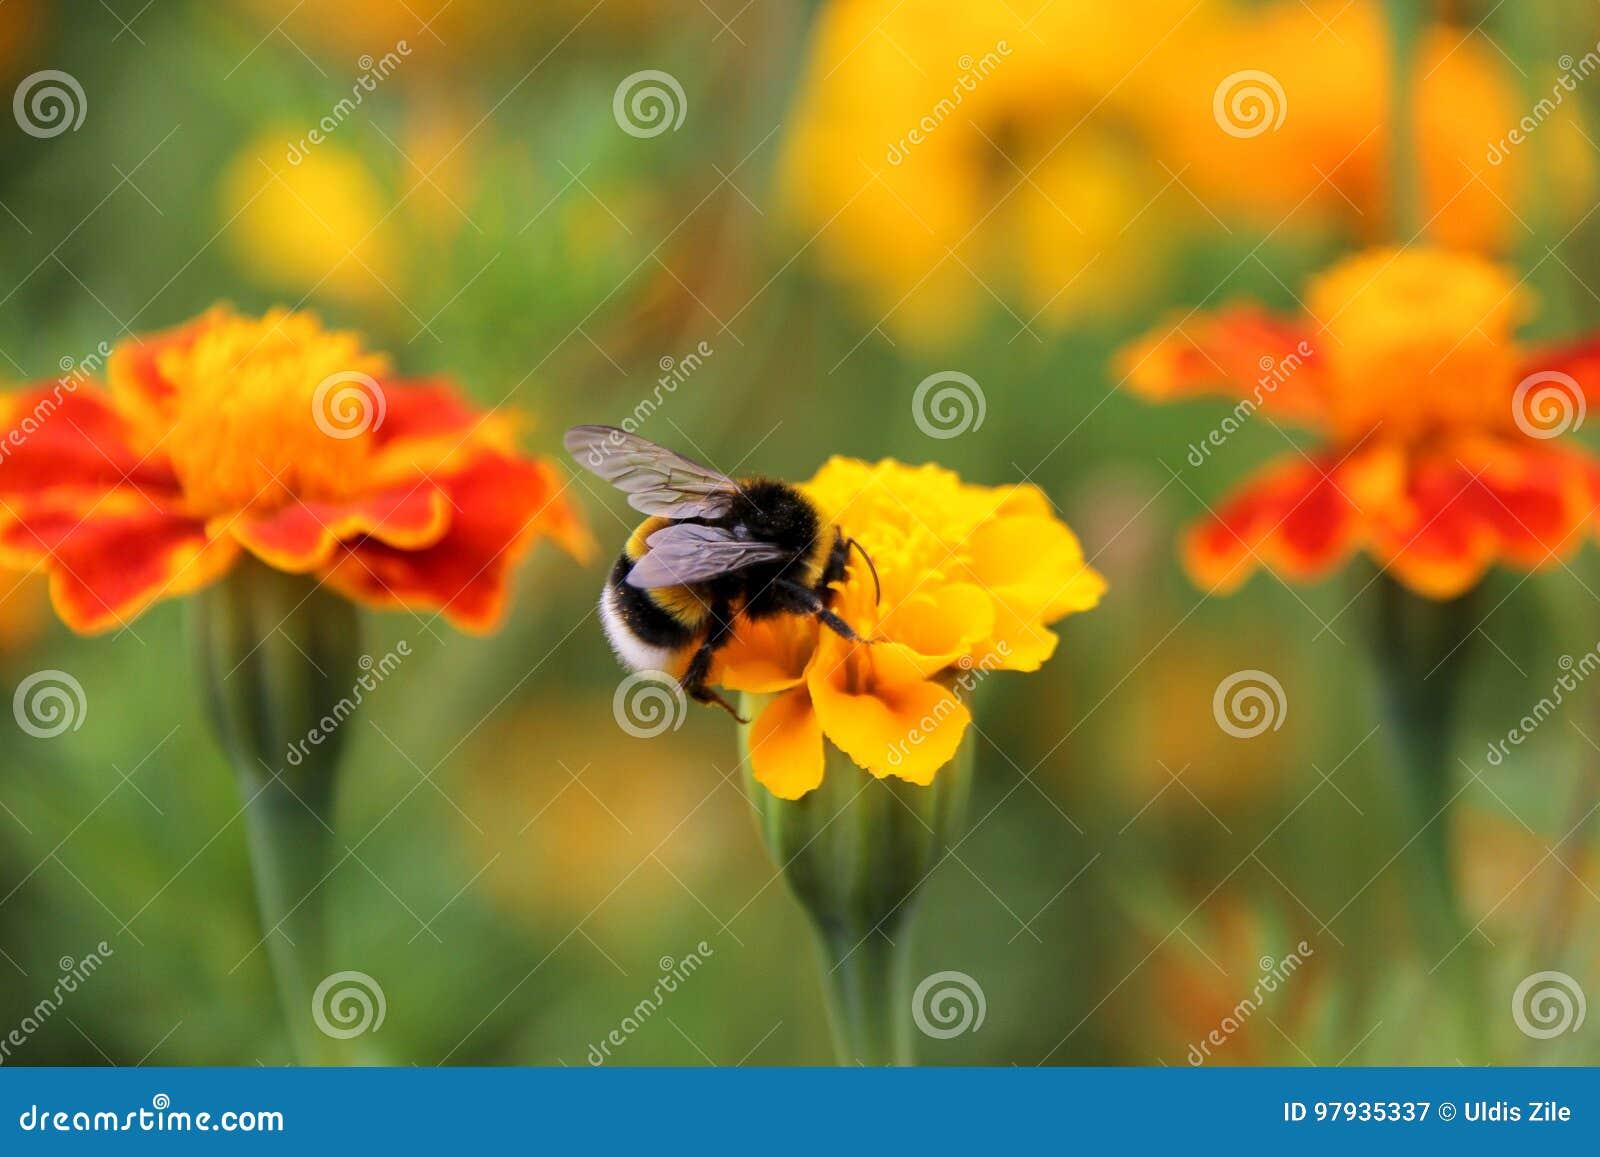 土蜂在tagetes花的饮料花蜜